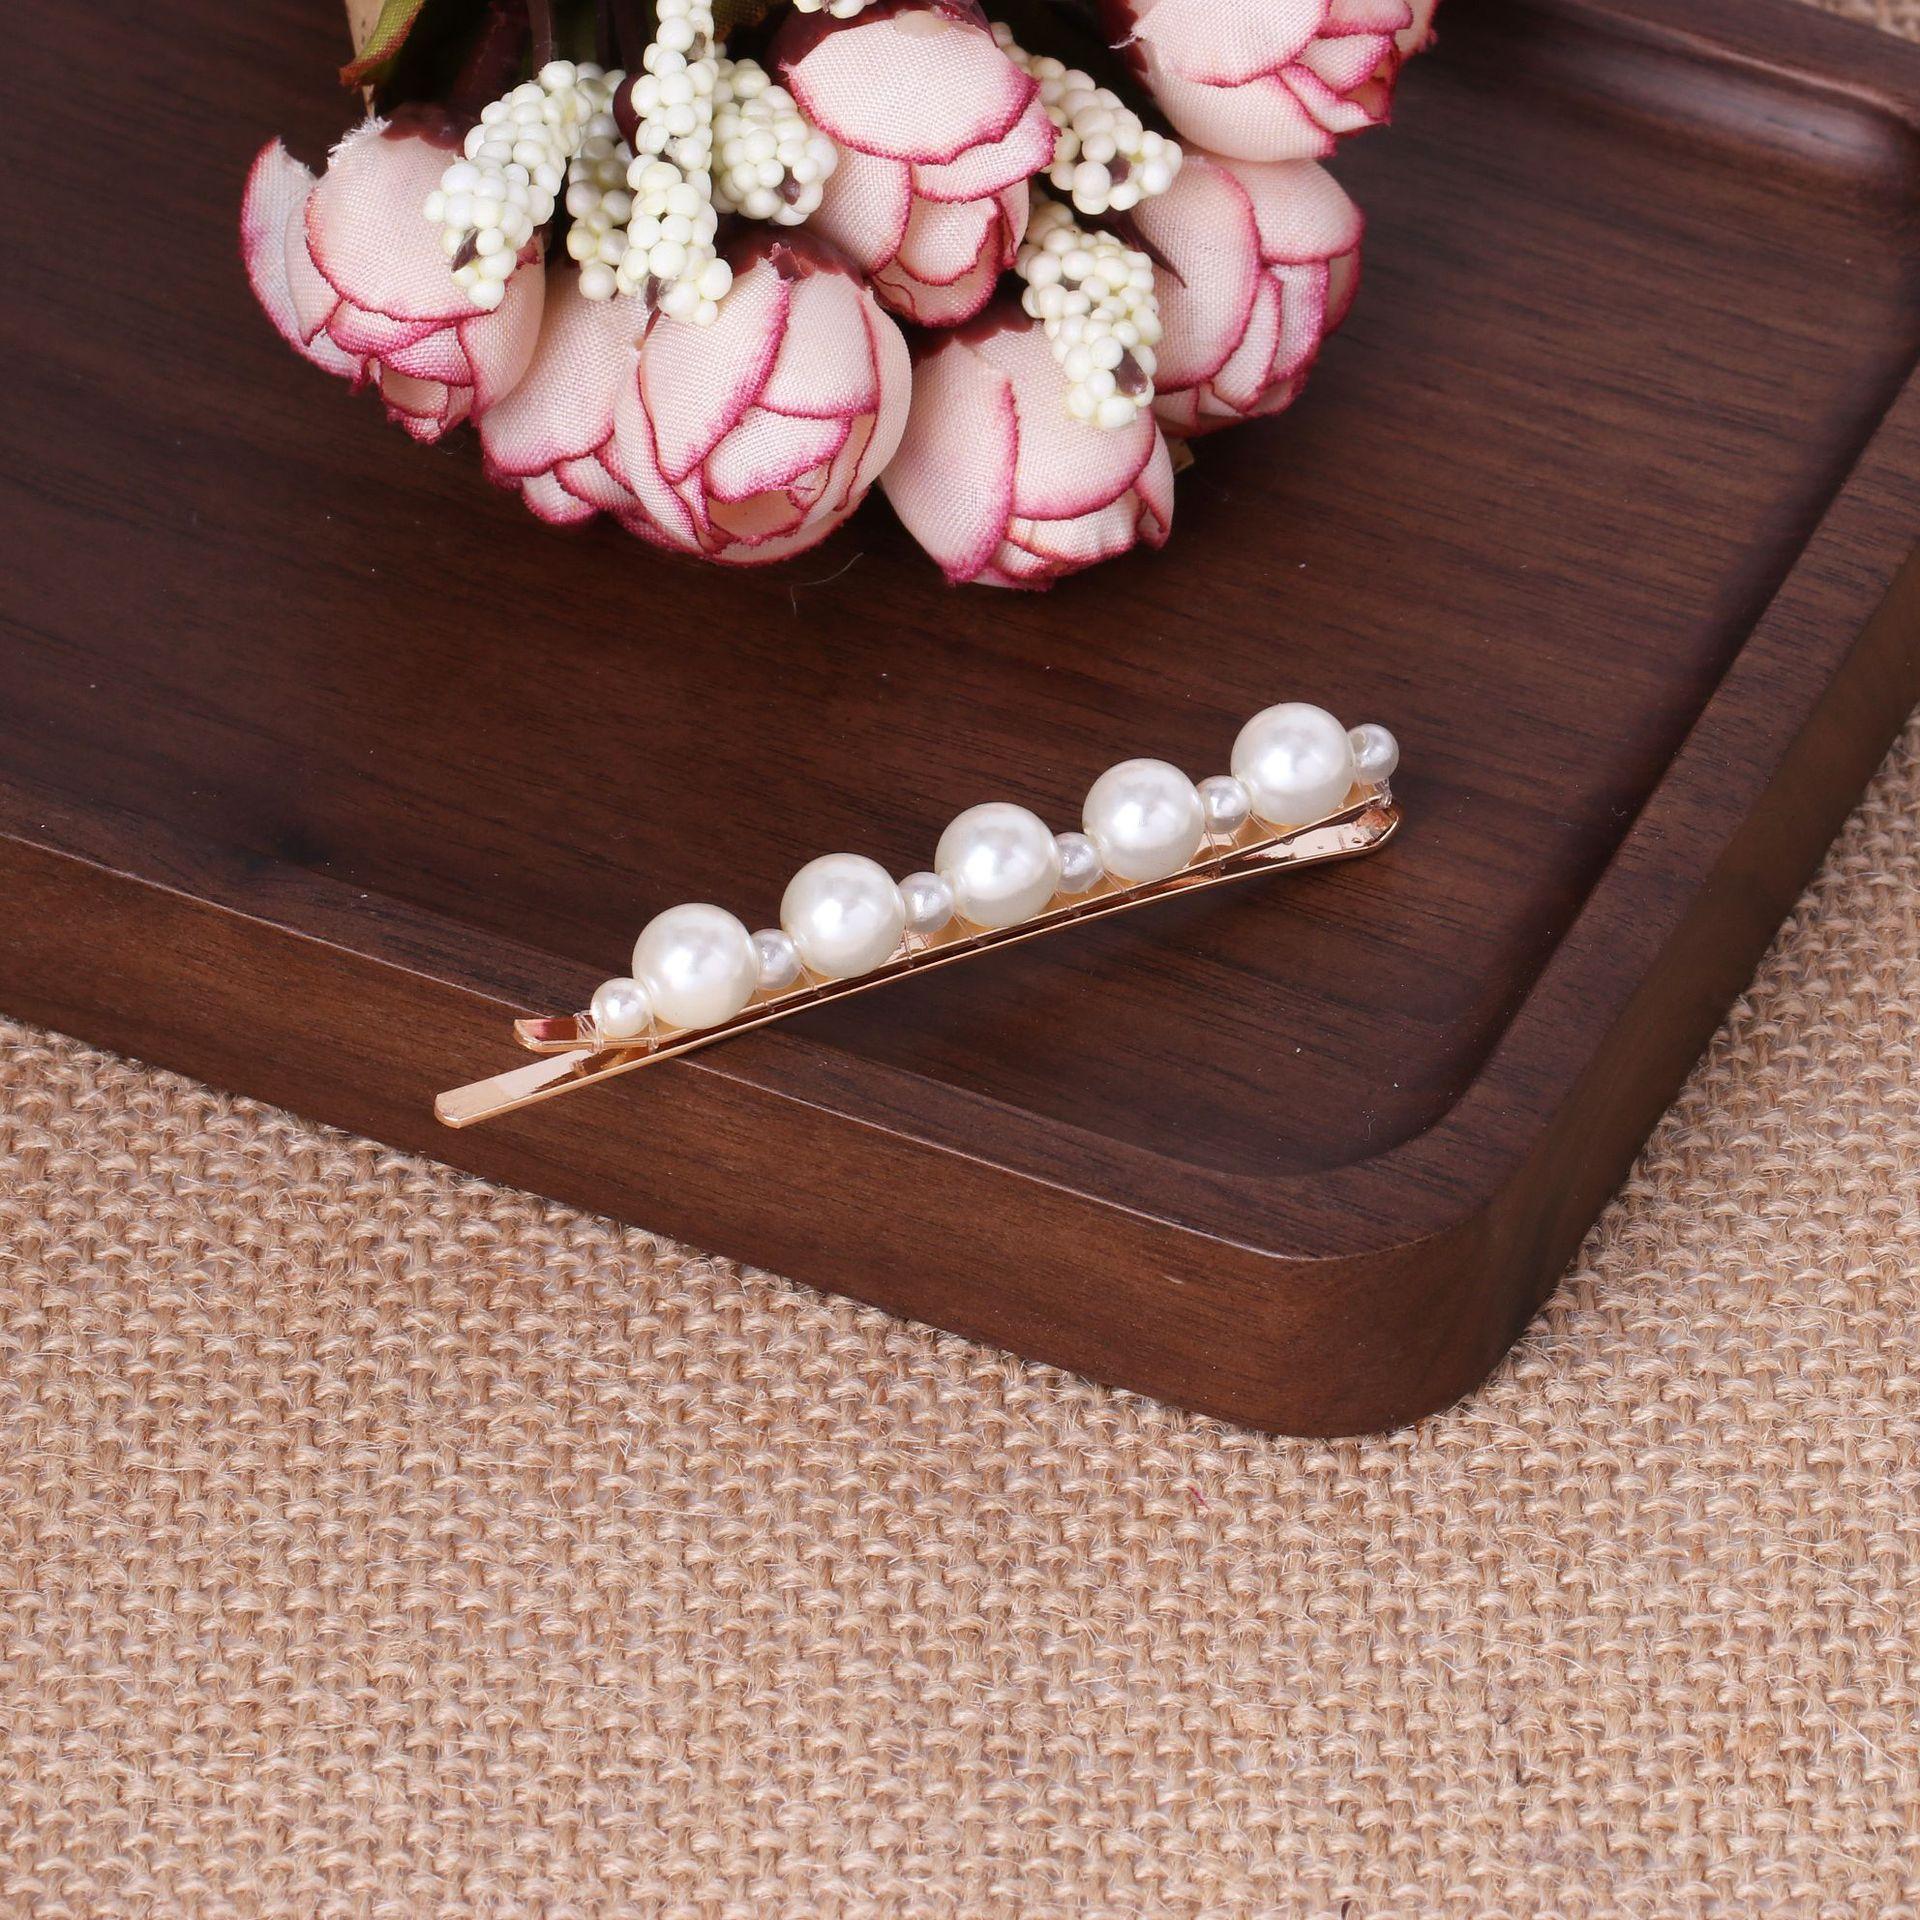 White Rabbit Love Geometry Beads Beads Accesorios para pelo de mujer JJ190505120236